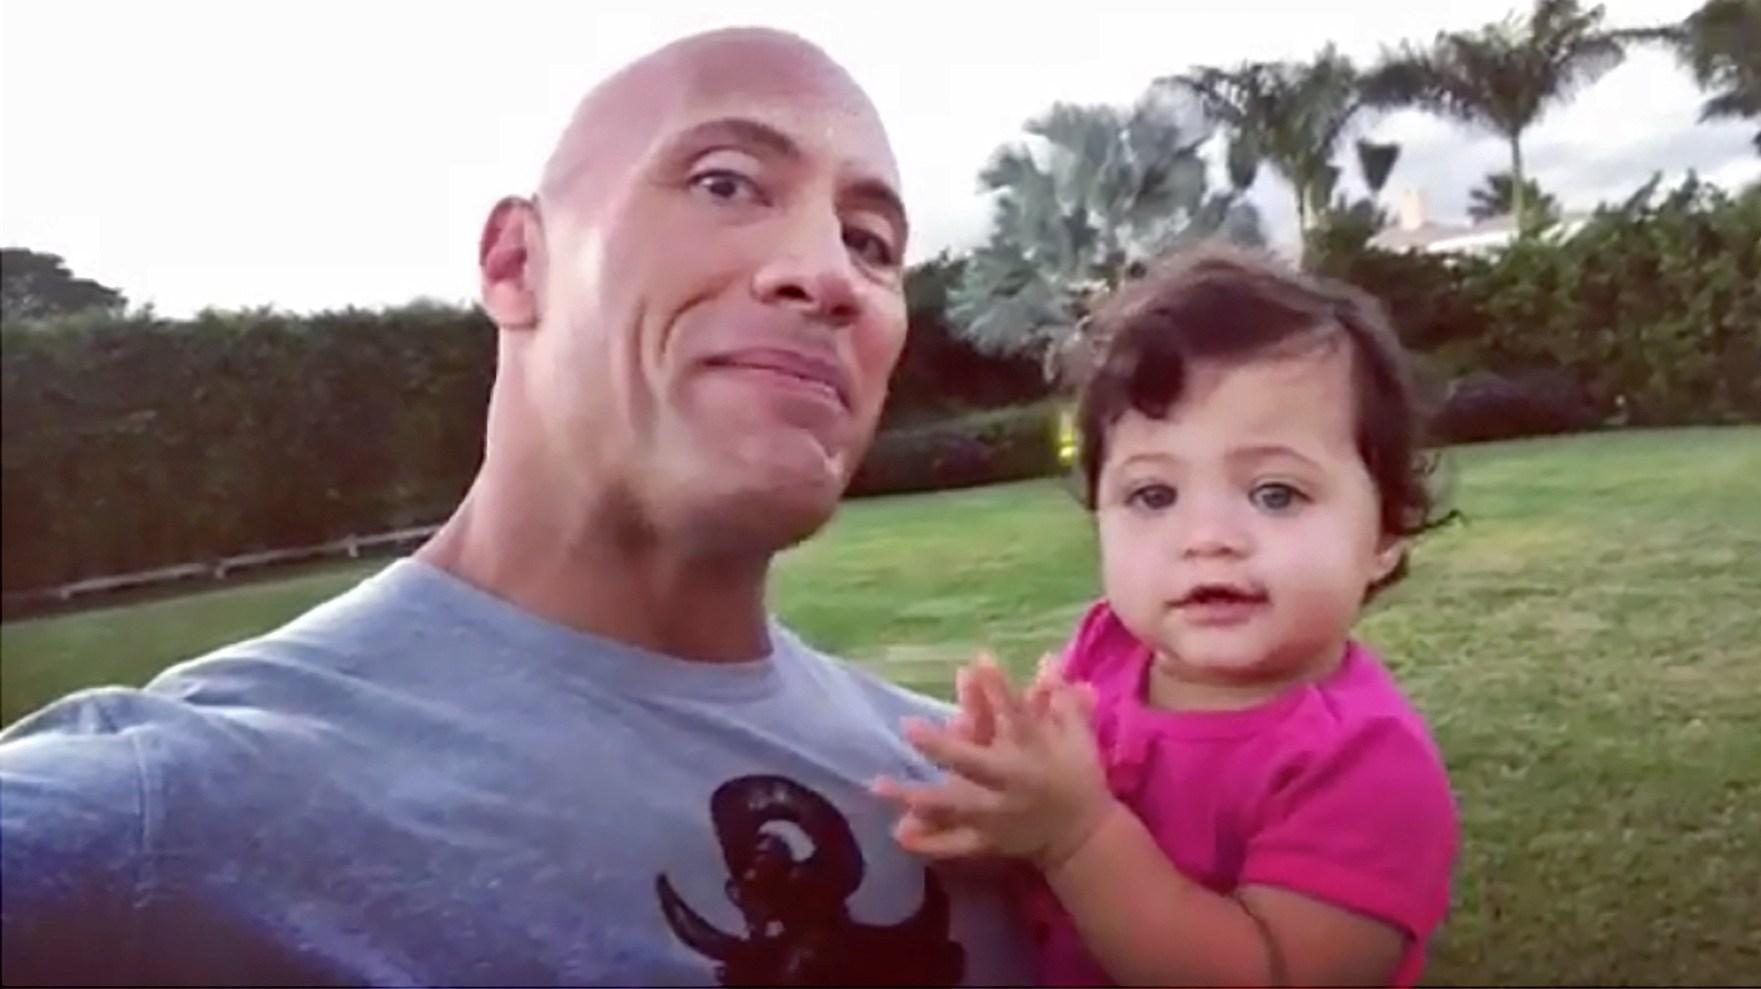 Dwayne 'The Rock' Johnson and Jasmine